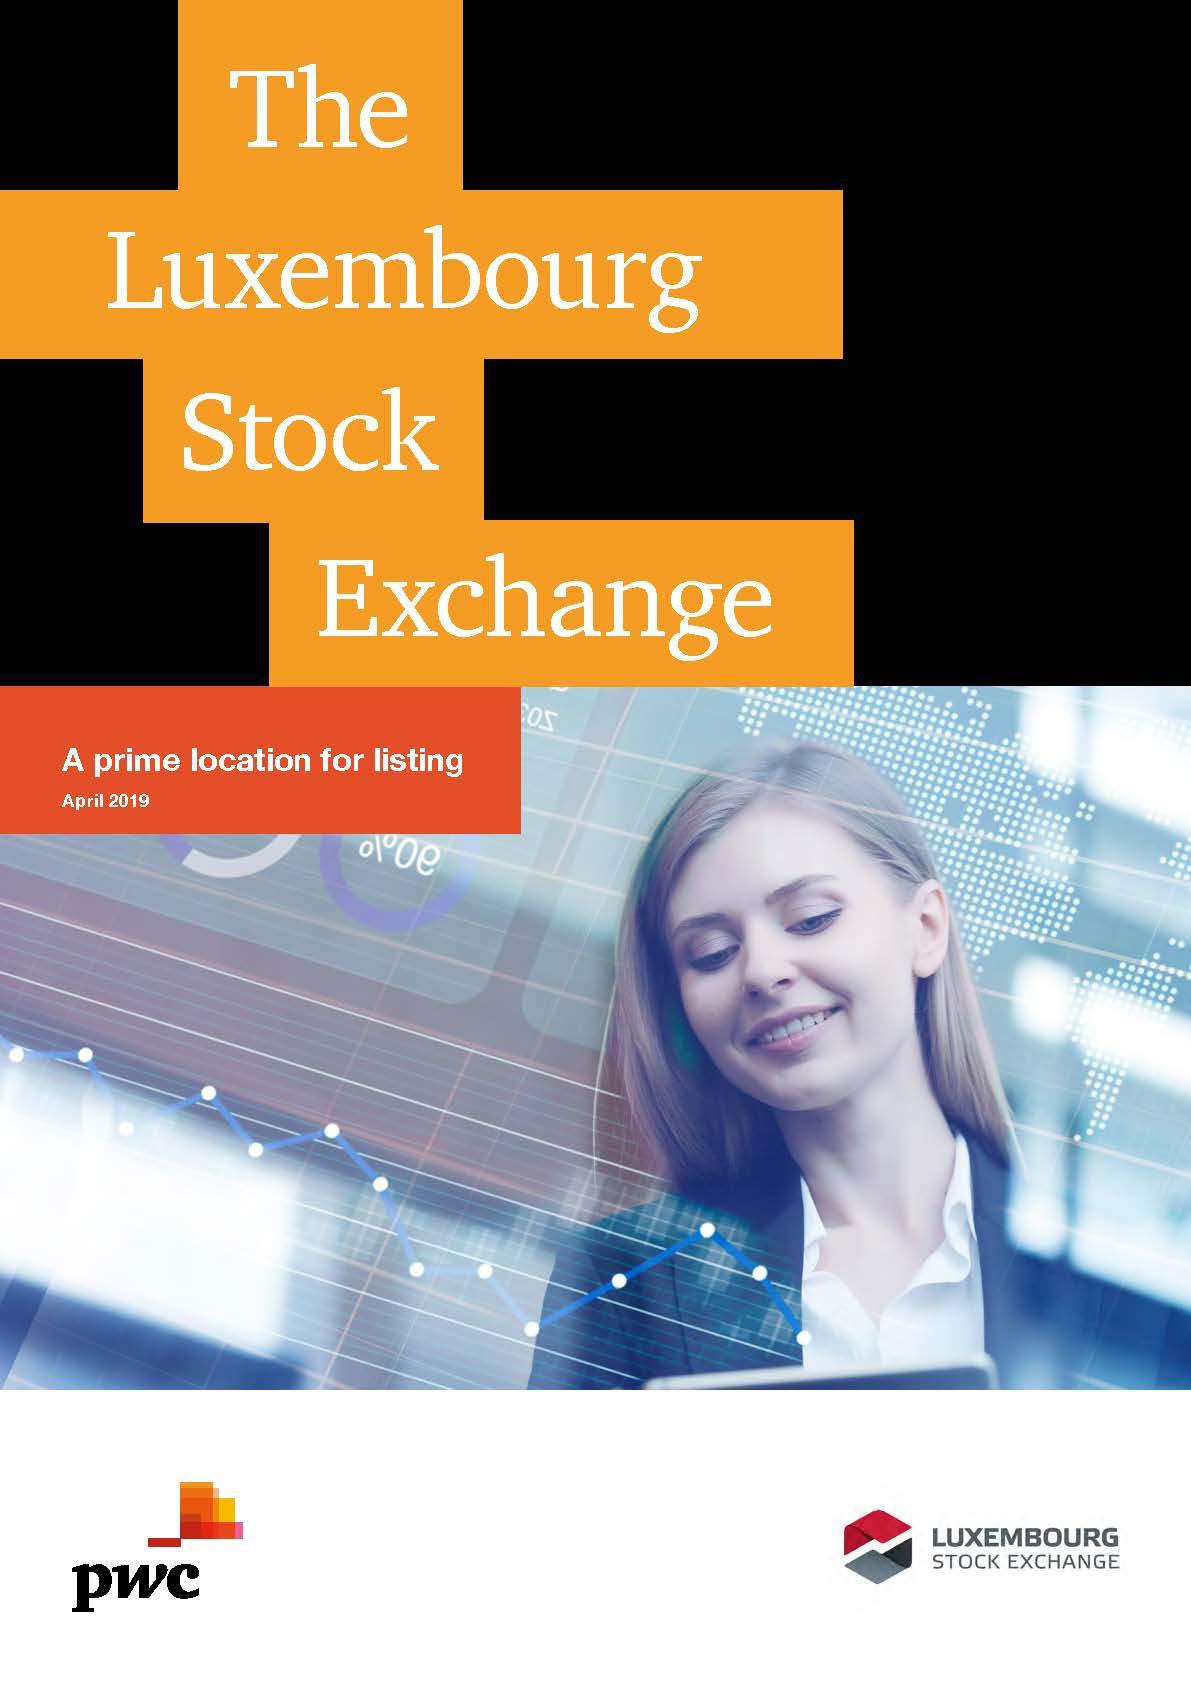 brochure-LISTING-luxse_prime_location_listing-pwc.jpg